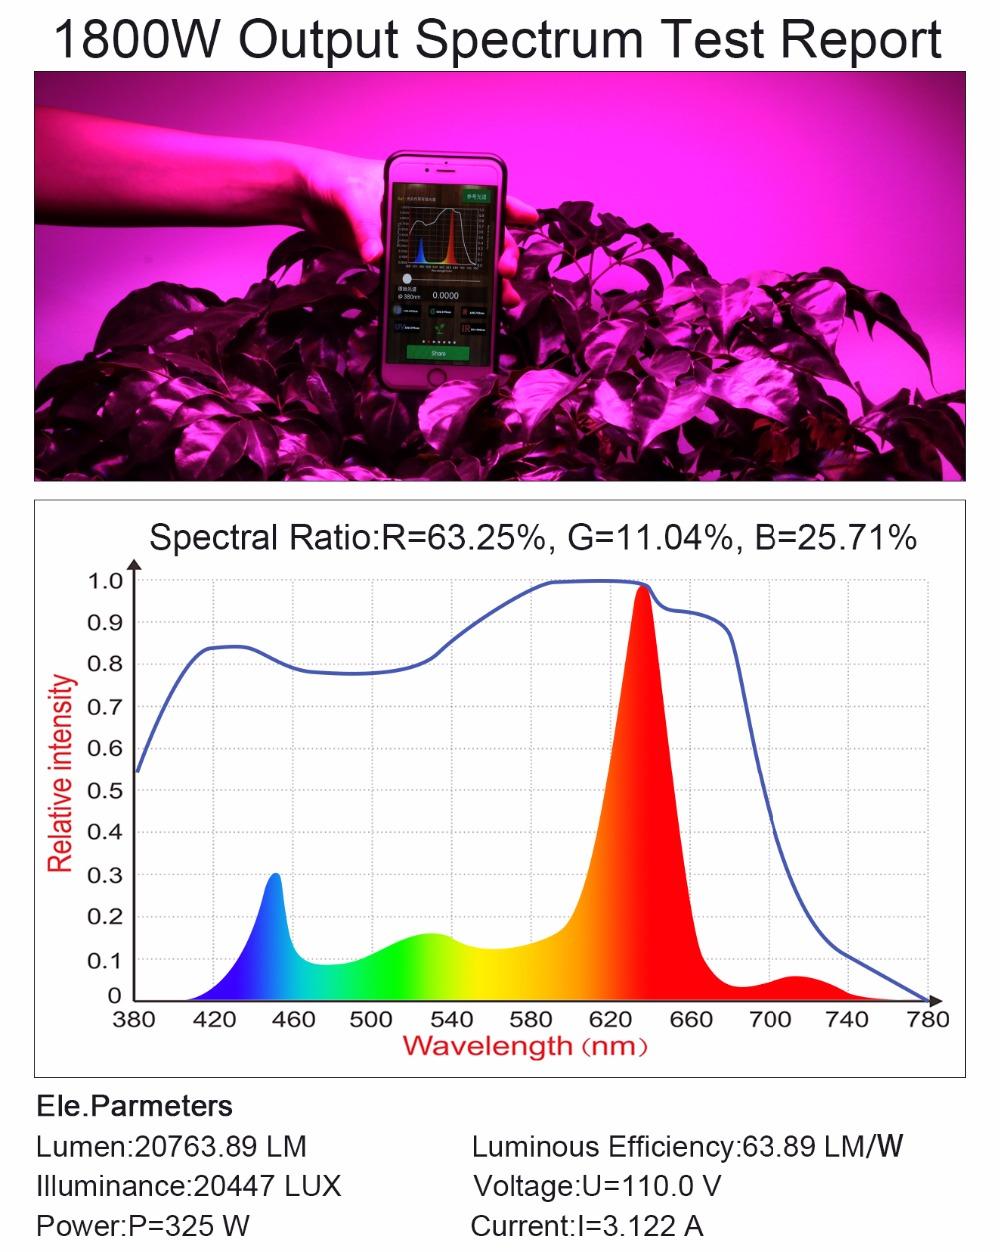 BestVA LED grow light 300/600/800/1000/1200/1500/1800/2000W Full Spectrum for Indoor Greenhouse grow tent plants grow led light